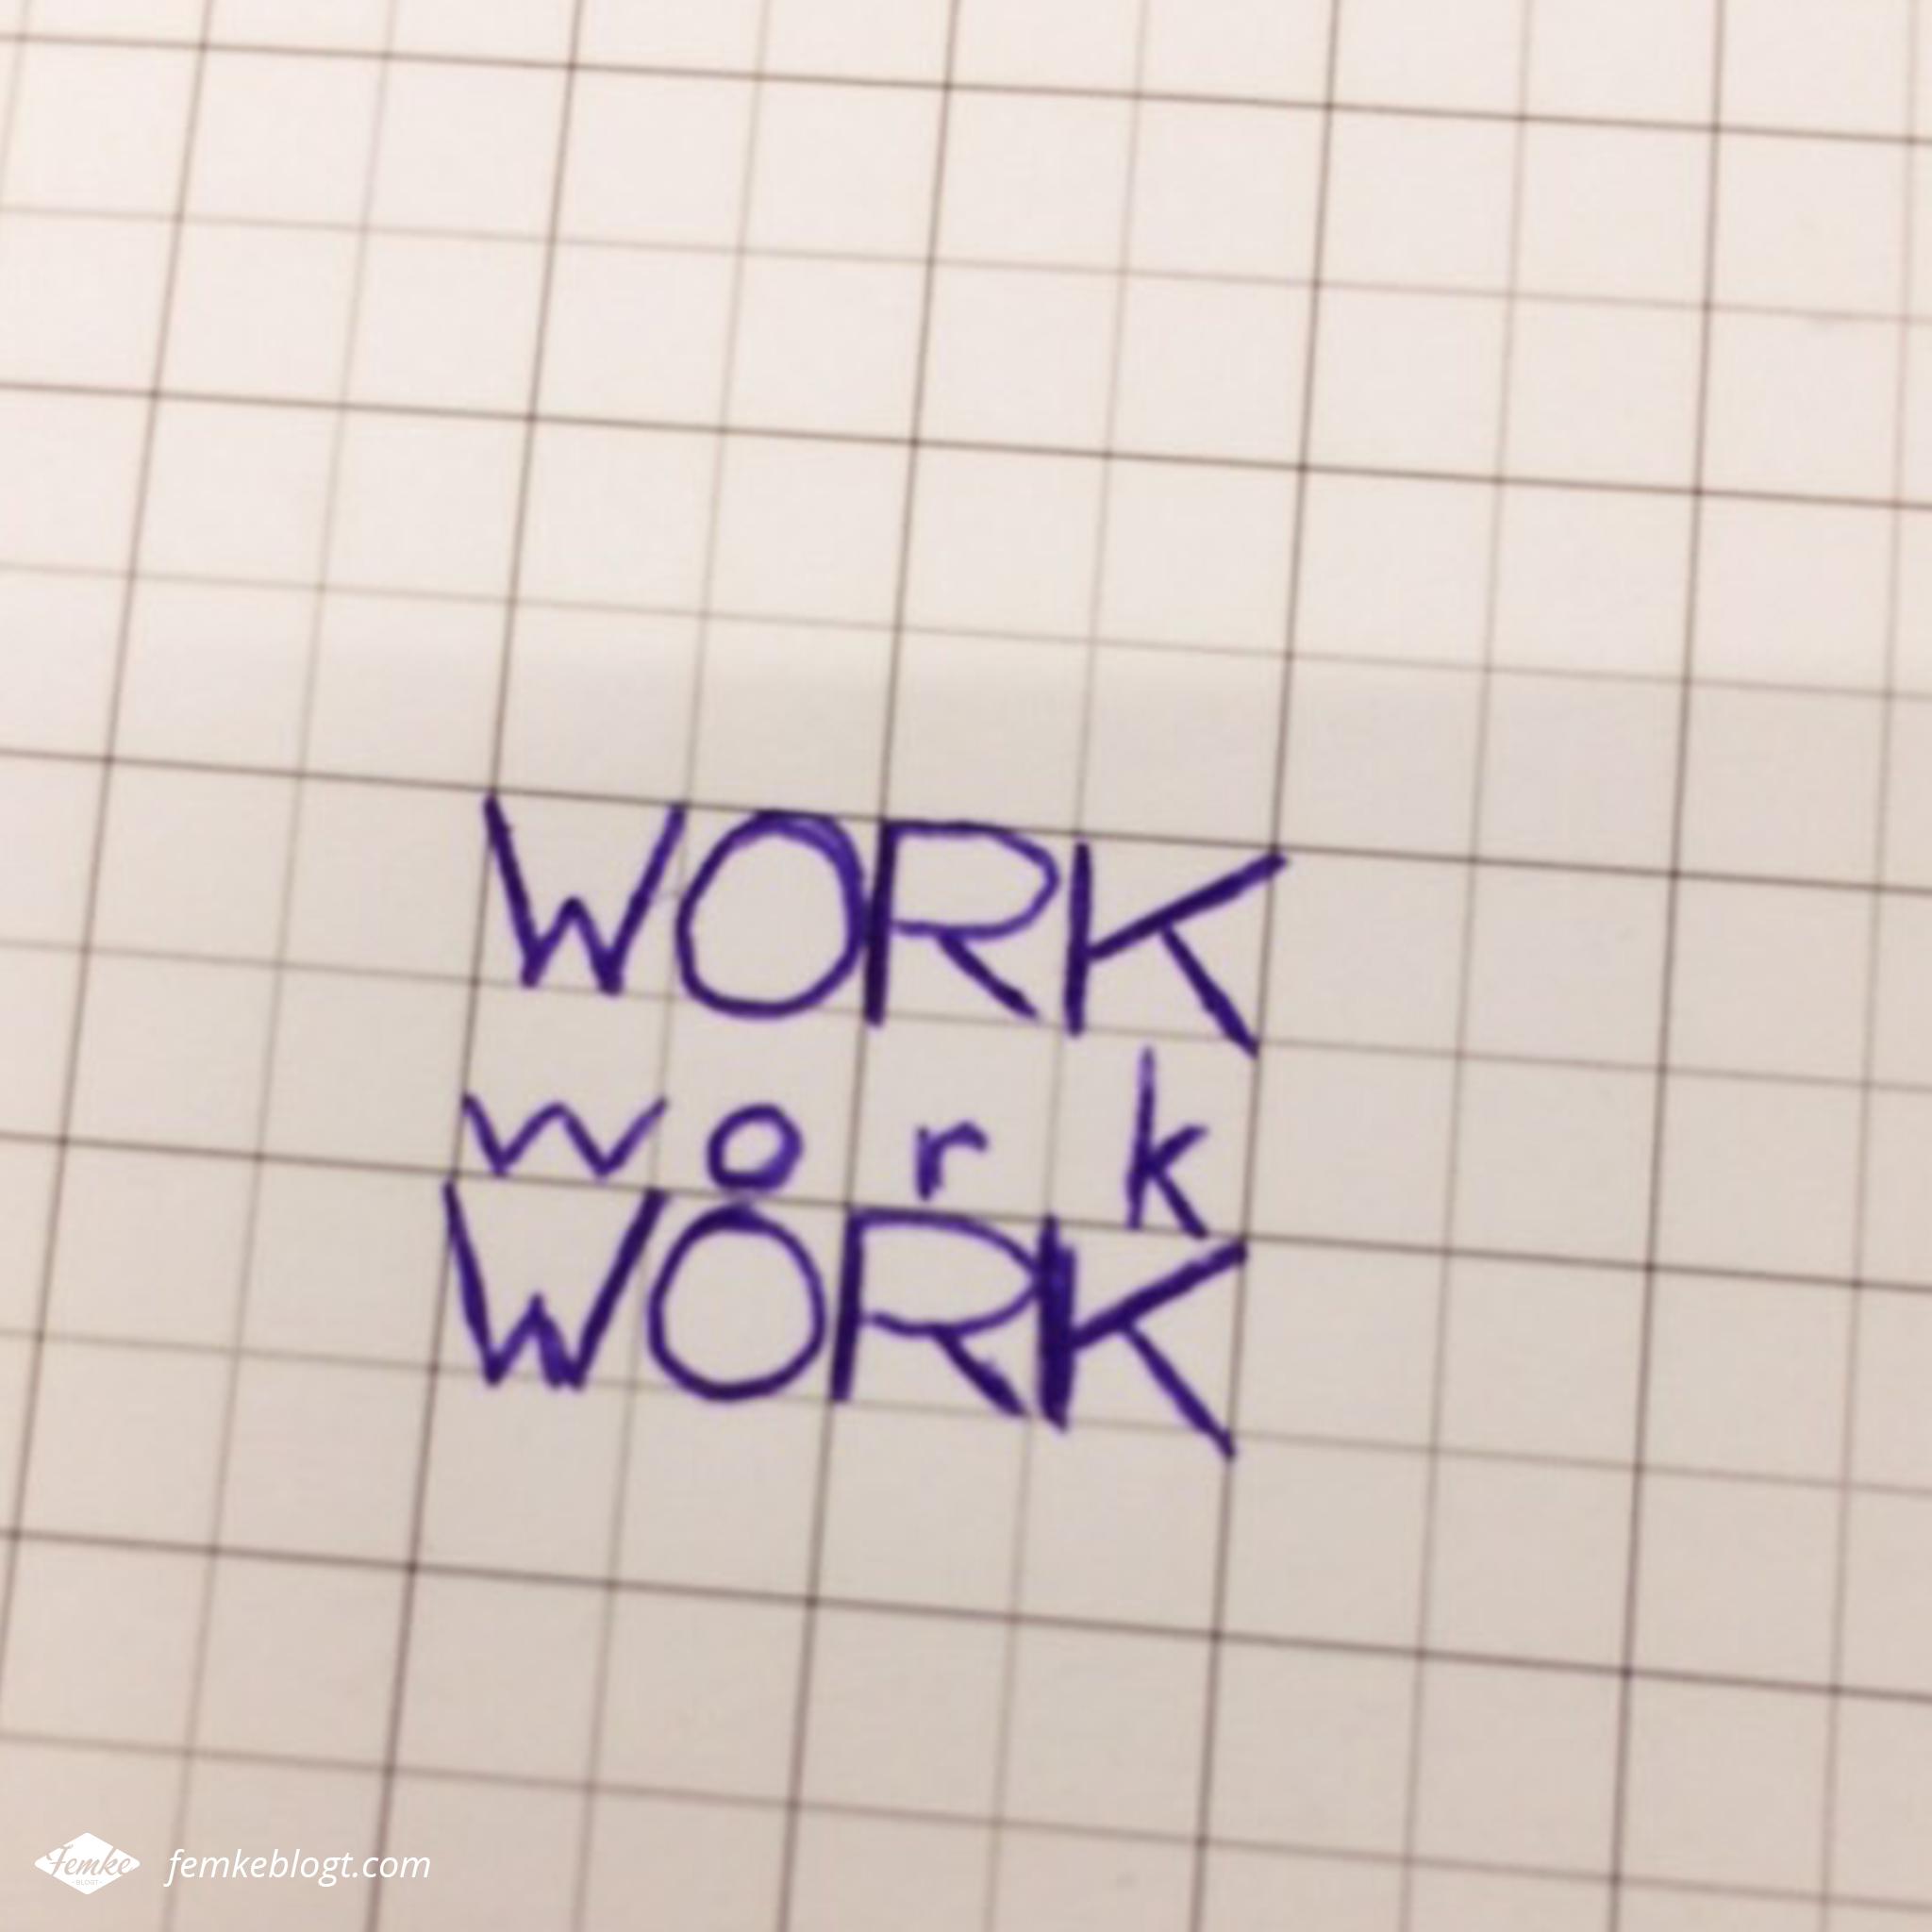 Oktober - Work work work